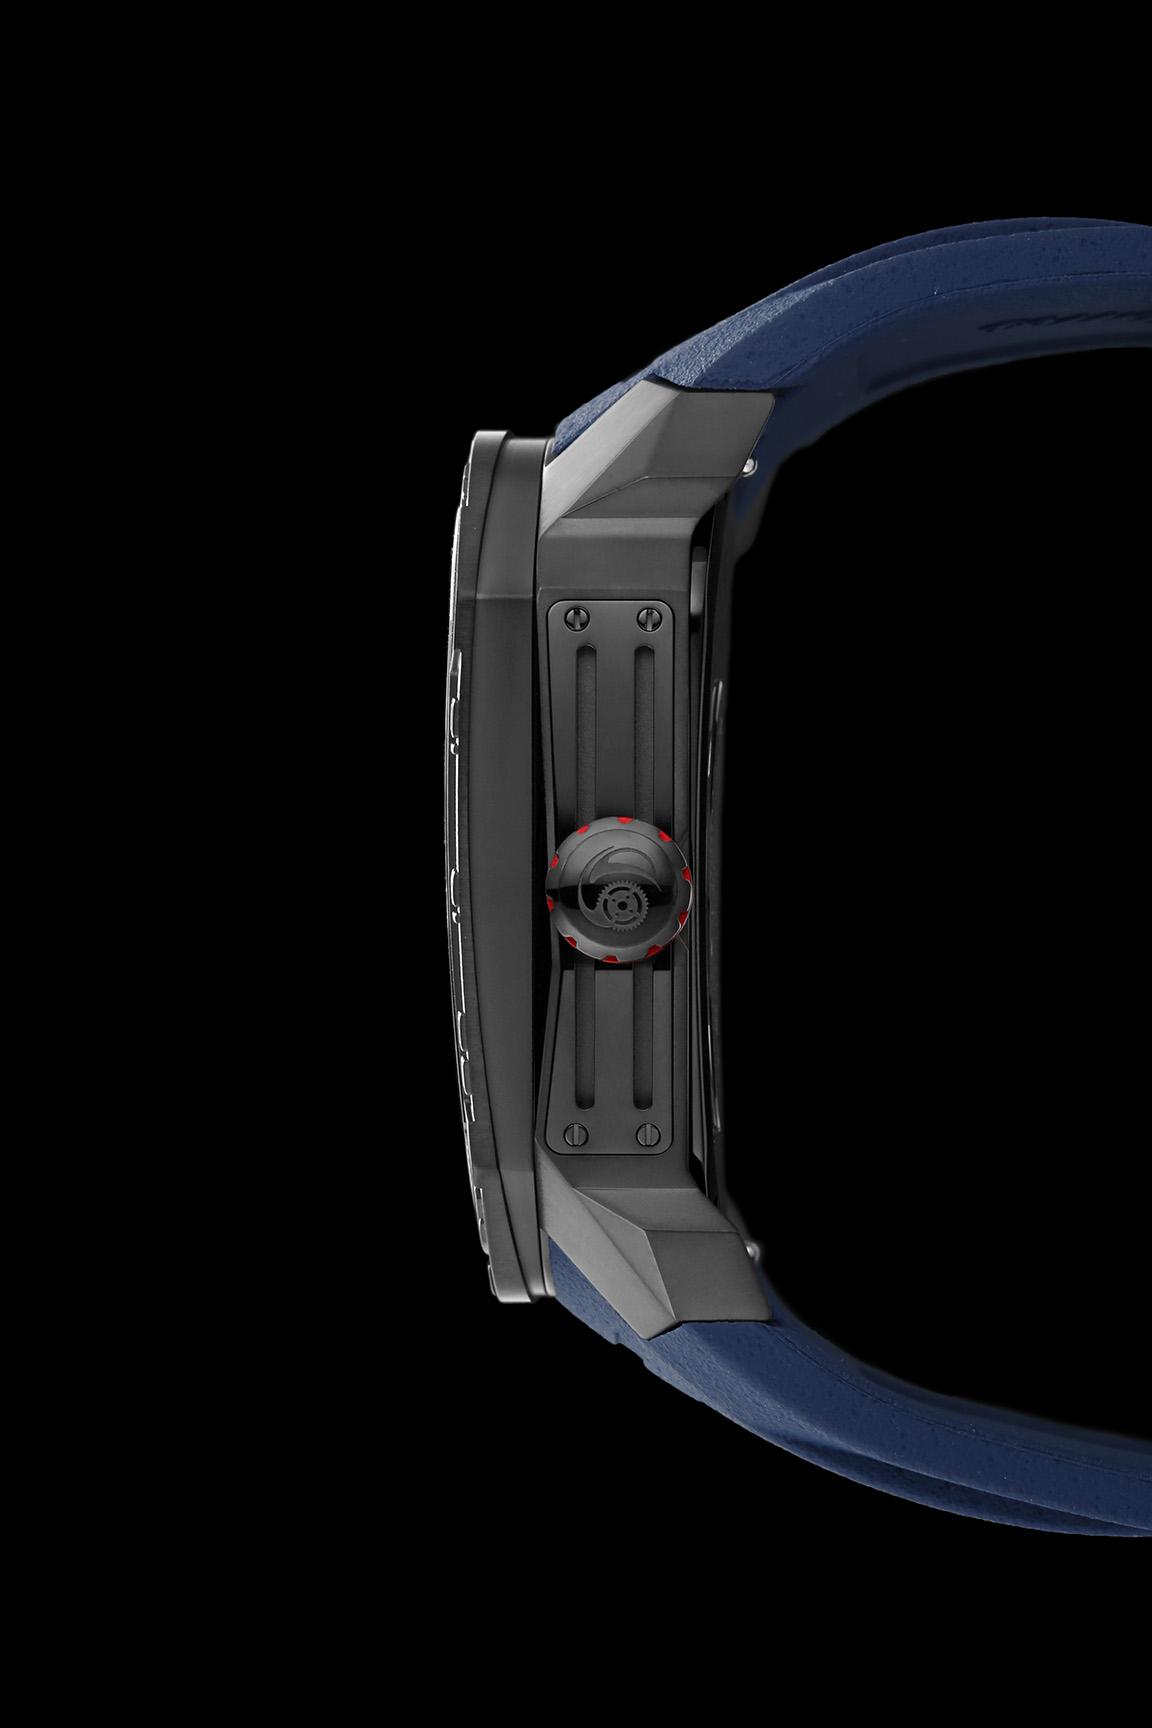 negatronic Laser Series Japanese Miyota Automatic Watch, Phantoms Watch Tourbillon, Sporty Mechanical Watch For Men